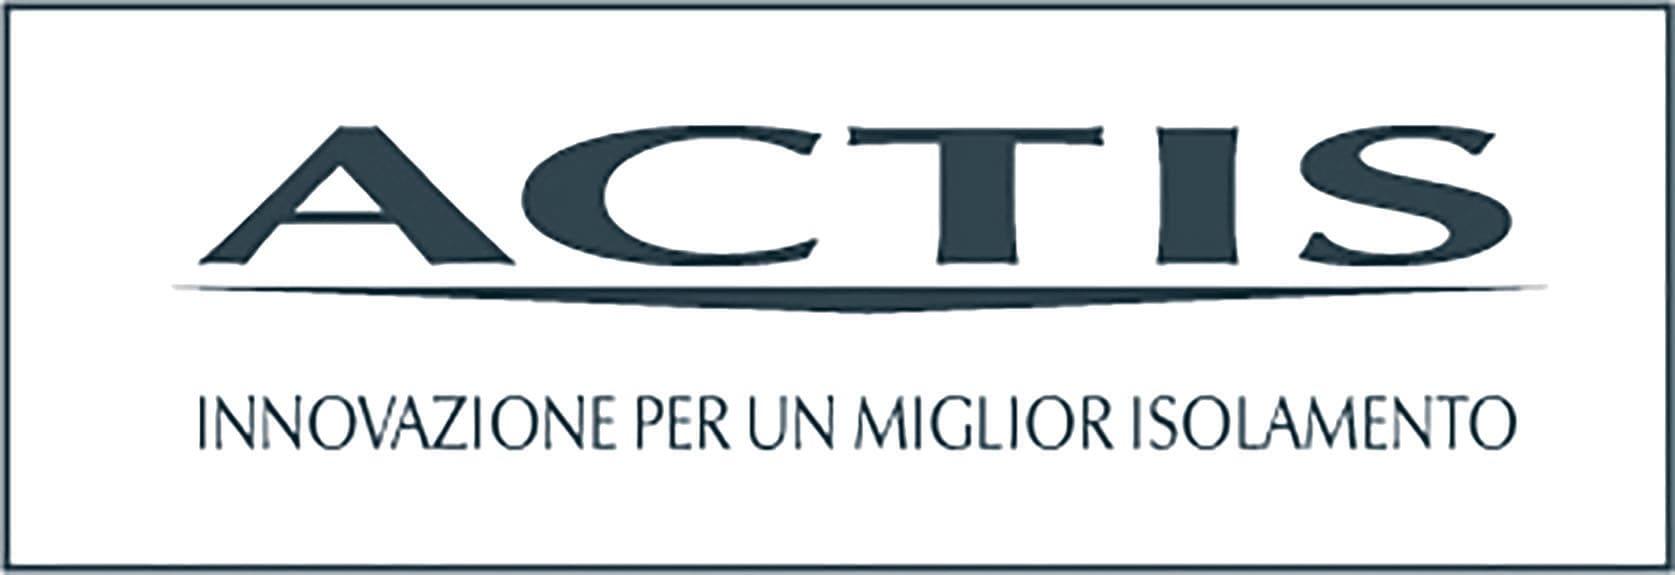 MC_Actis